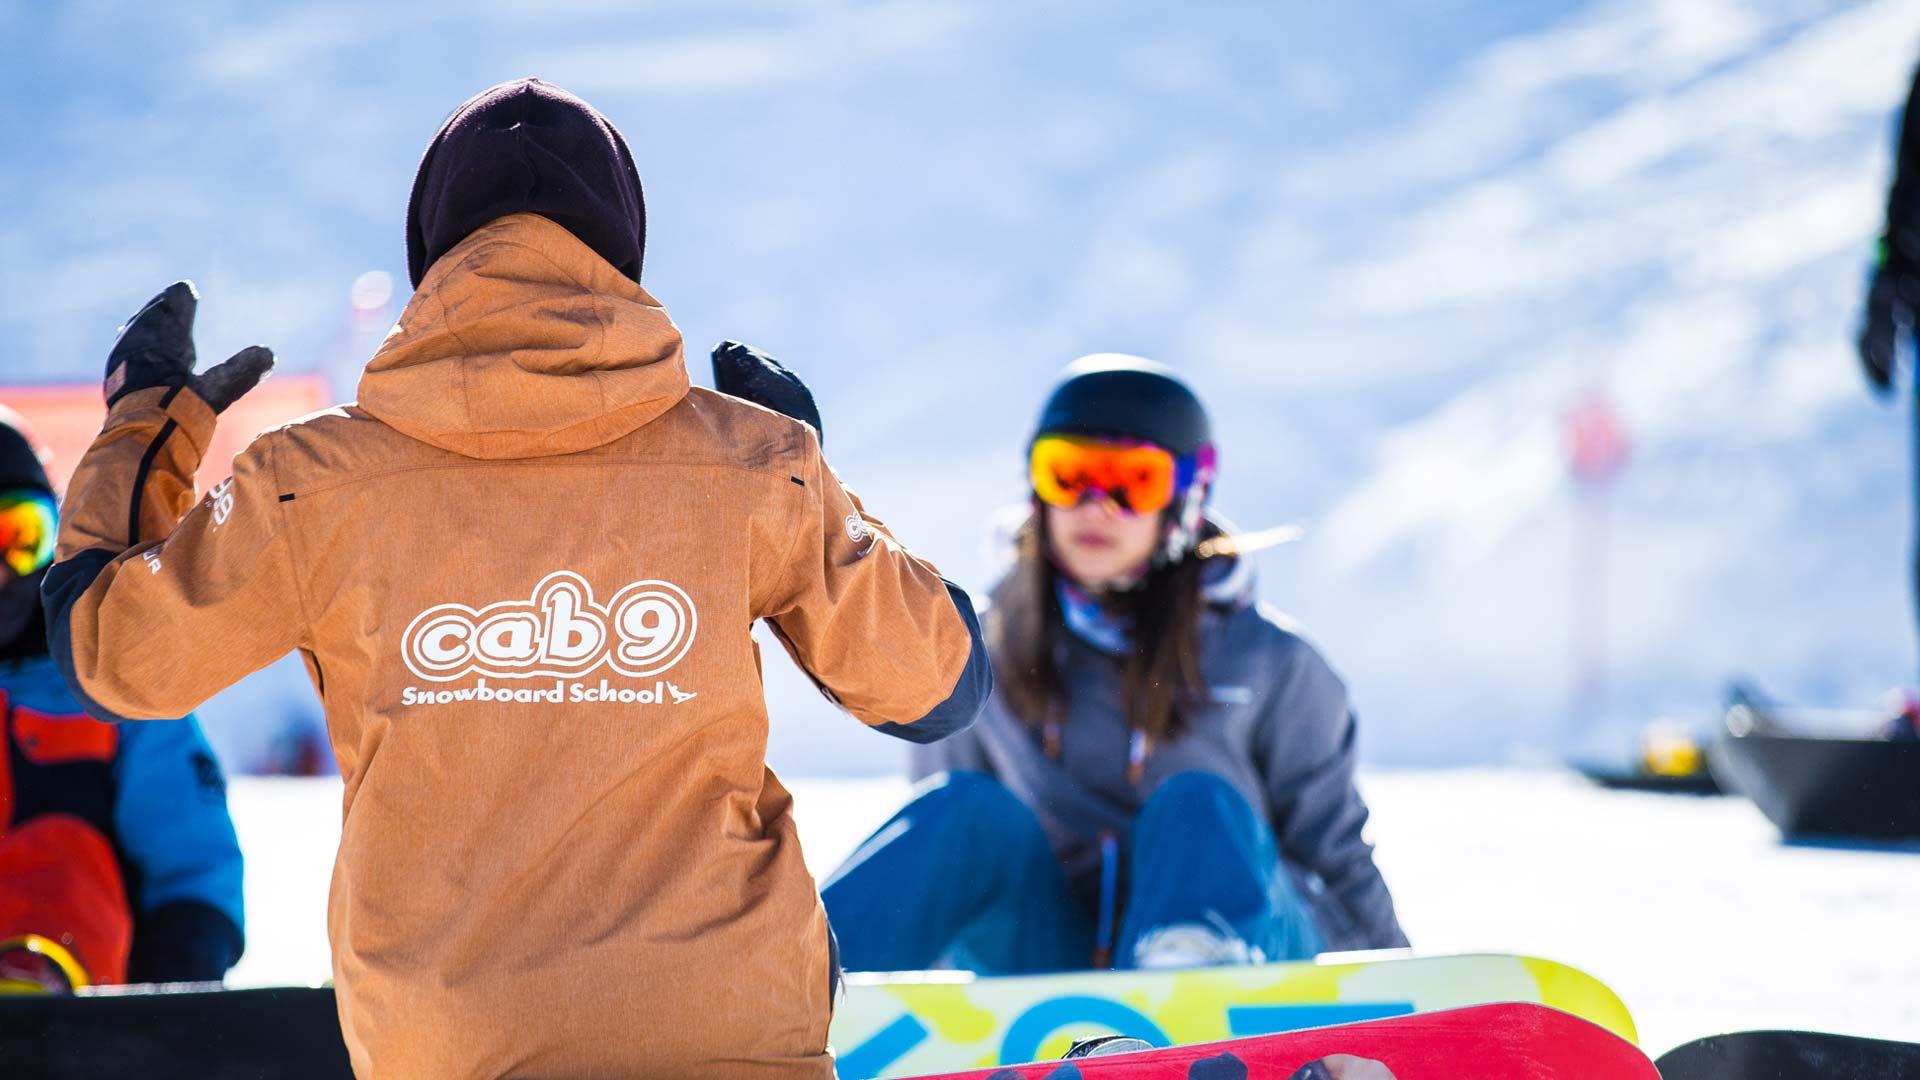 Cab9 Snowboard Instructor teaching group snowboarding lessons Meribel